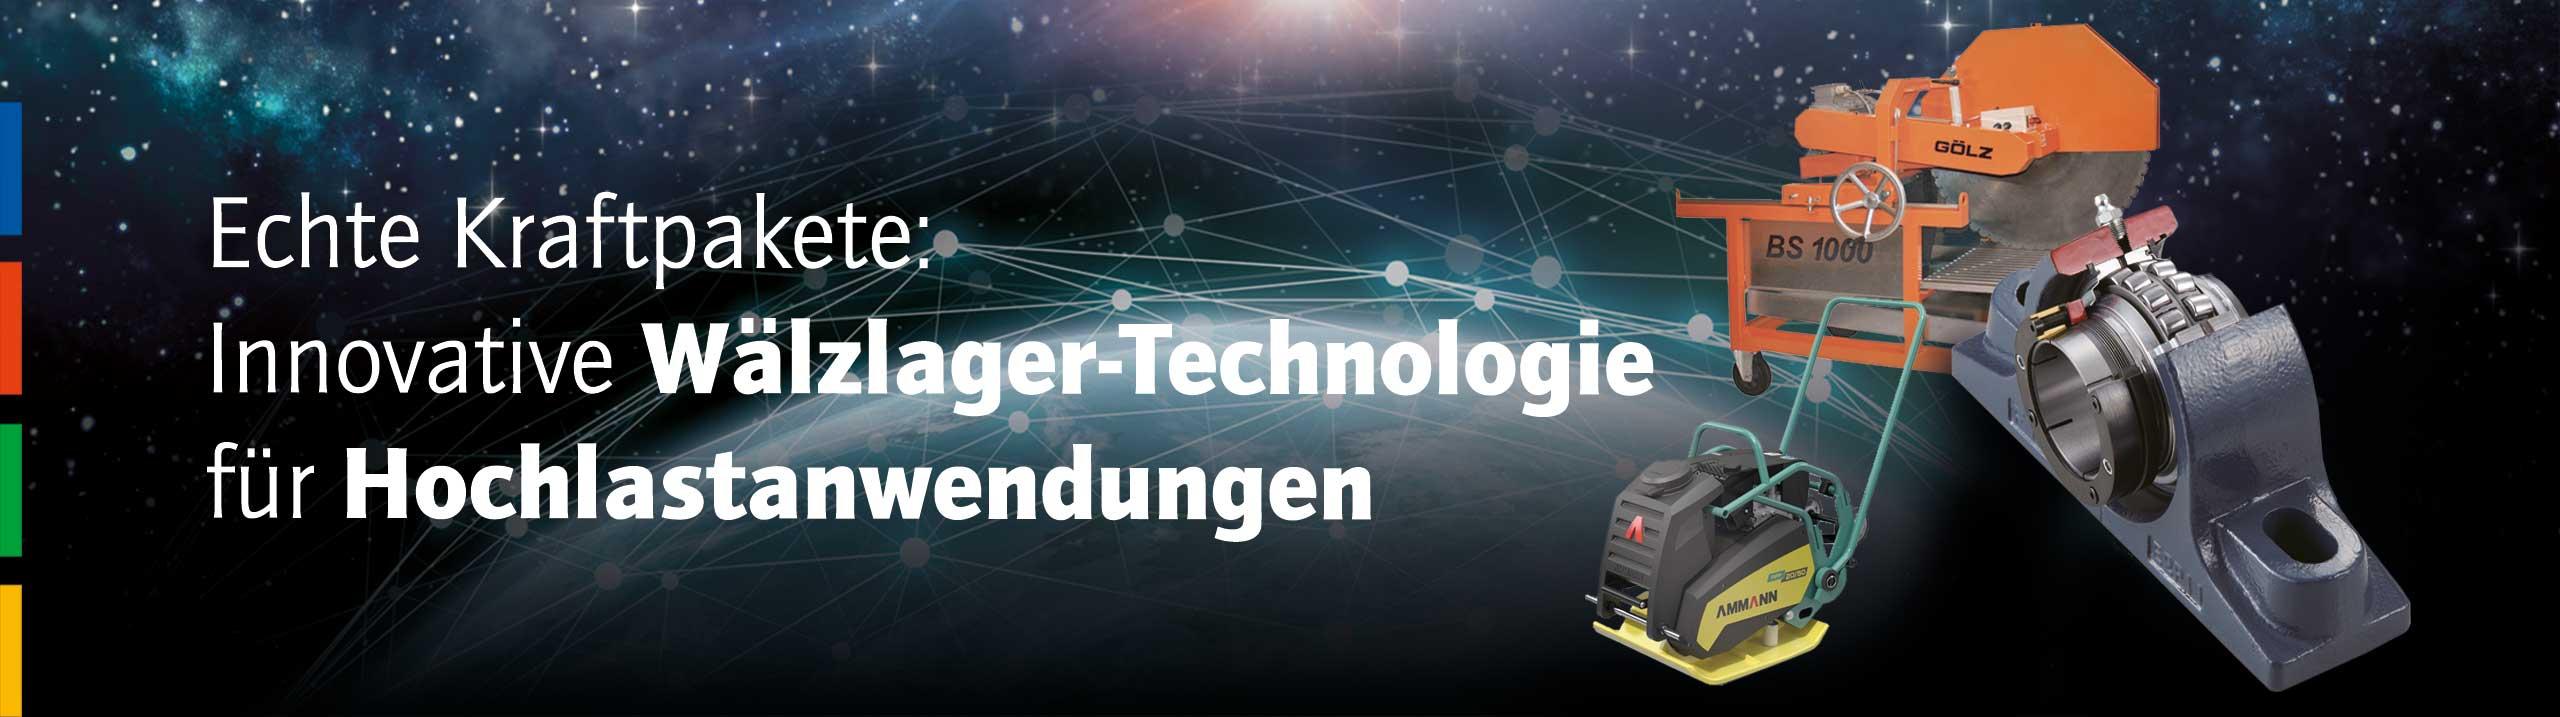 Findling Wälzlager GmbH